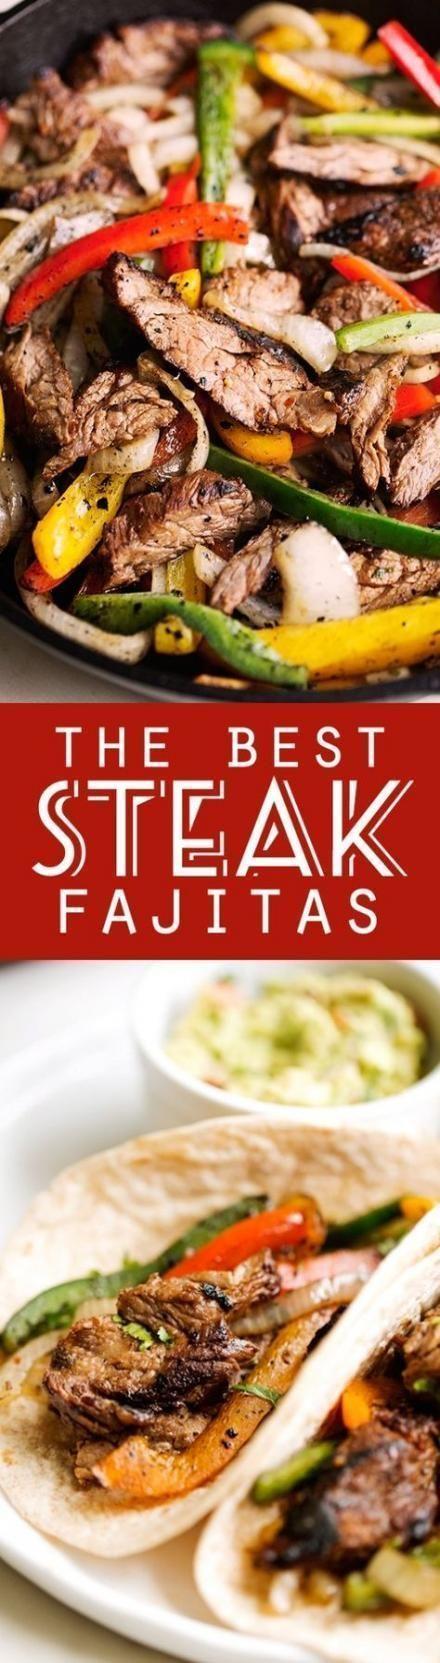 Super skirt steak marinade mexican beef 61+ Ideas - #Beef #Ideas #Marinade #mexi #marinadeforskirtsteak Super skirt steak marinade mexican beef 61+ Ideas - #Beef #Ideas #Marinade #mexi... - #Beef #Ideas #Marinade #mexi #mexican #Skirt #Steak #super #steakfajitarecipe Super skirt steak marinade mexican beef 61+ Ideas - #Beef #Ideas #Marinade #mexi #marinadeforskirtsteak Super skirt steak marinade mexican beef 61+ Ideas - #Beef #Ideas #Marinade #mexi... - #Beef #Ideas #Marinade #mexi #mexican #Ski #marinadeforskirtsteak